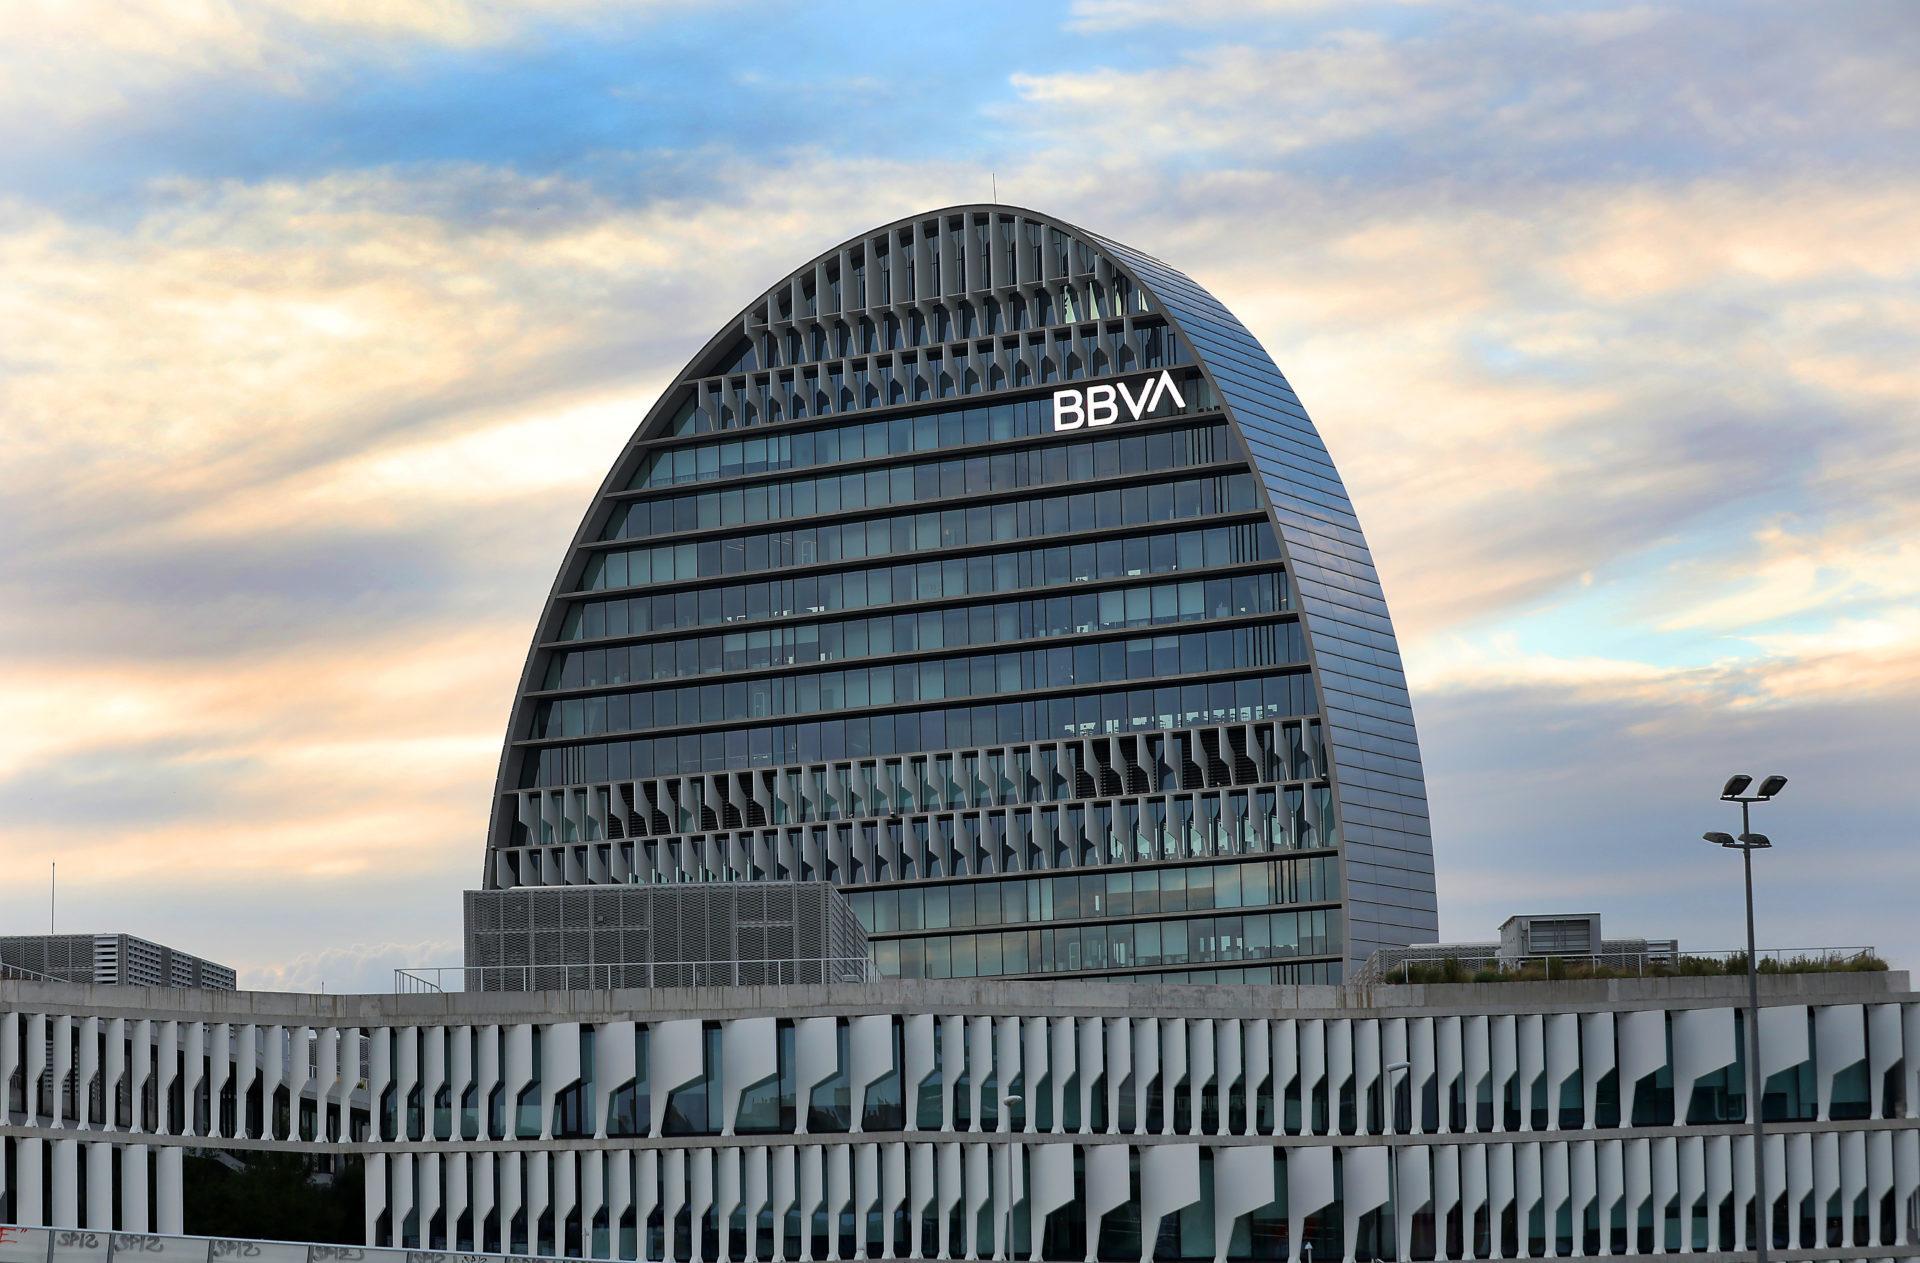 https://shareholdersandinvestors.bbva.com/wp-content/uploads/2020/07/Vela-Ciudad-BBVA-1920x1263-1920x1263.jpg